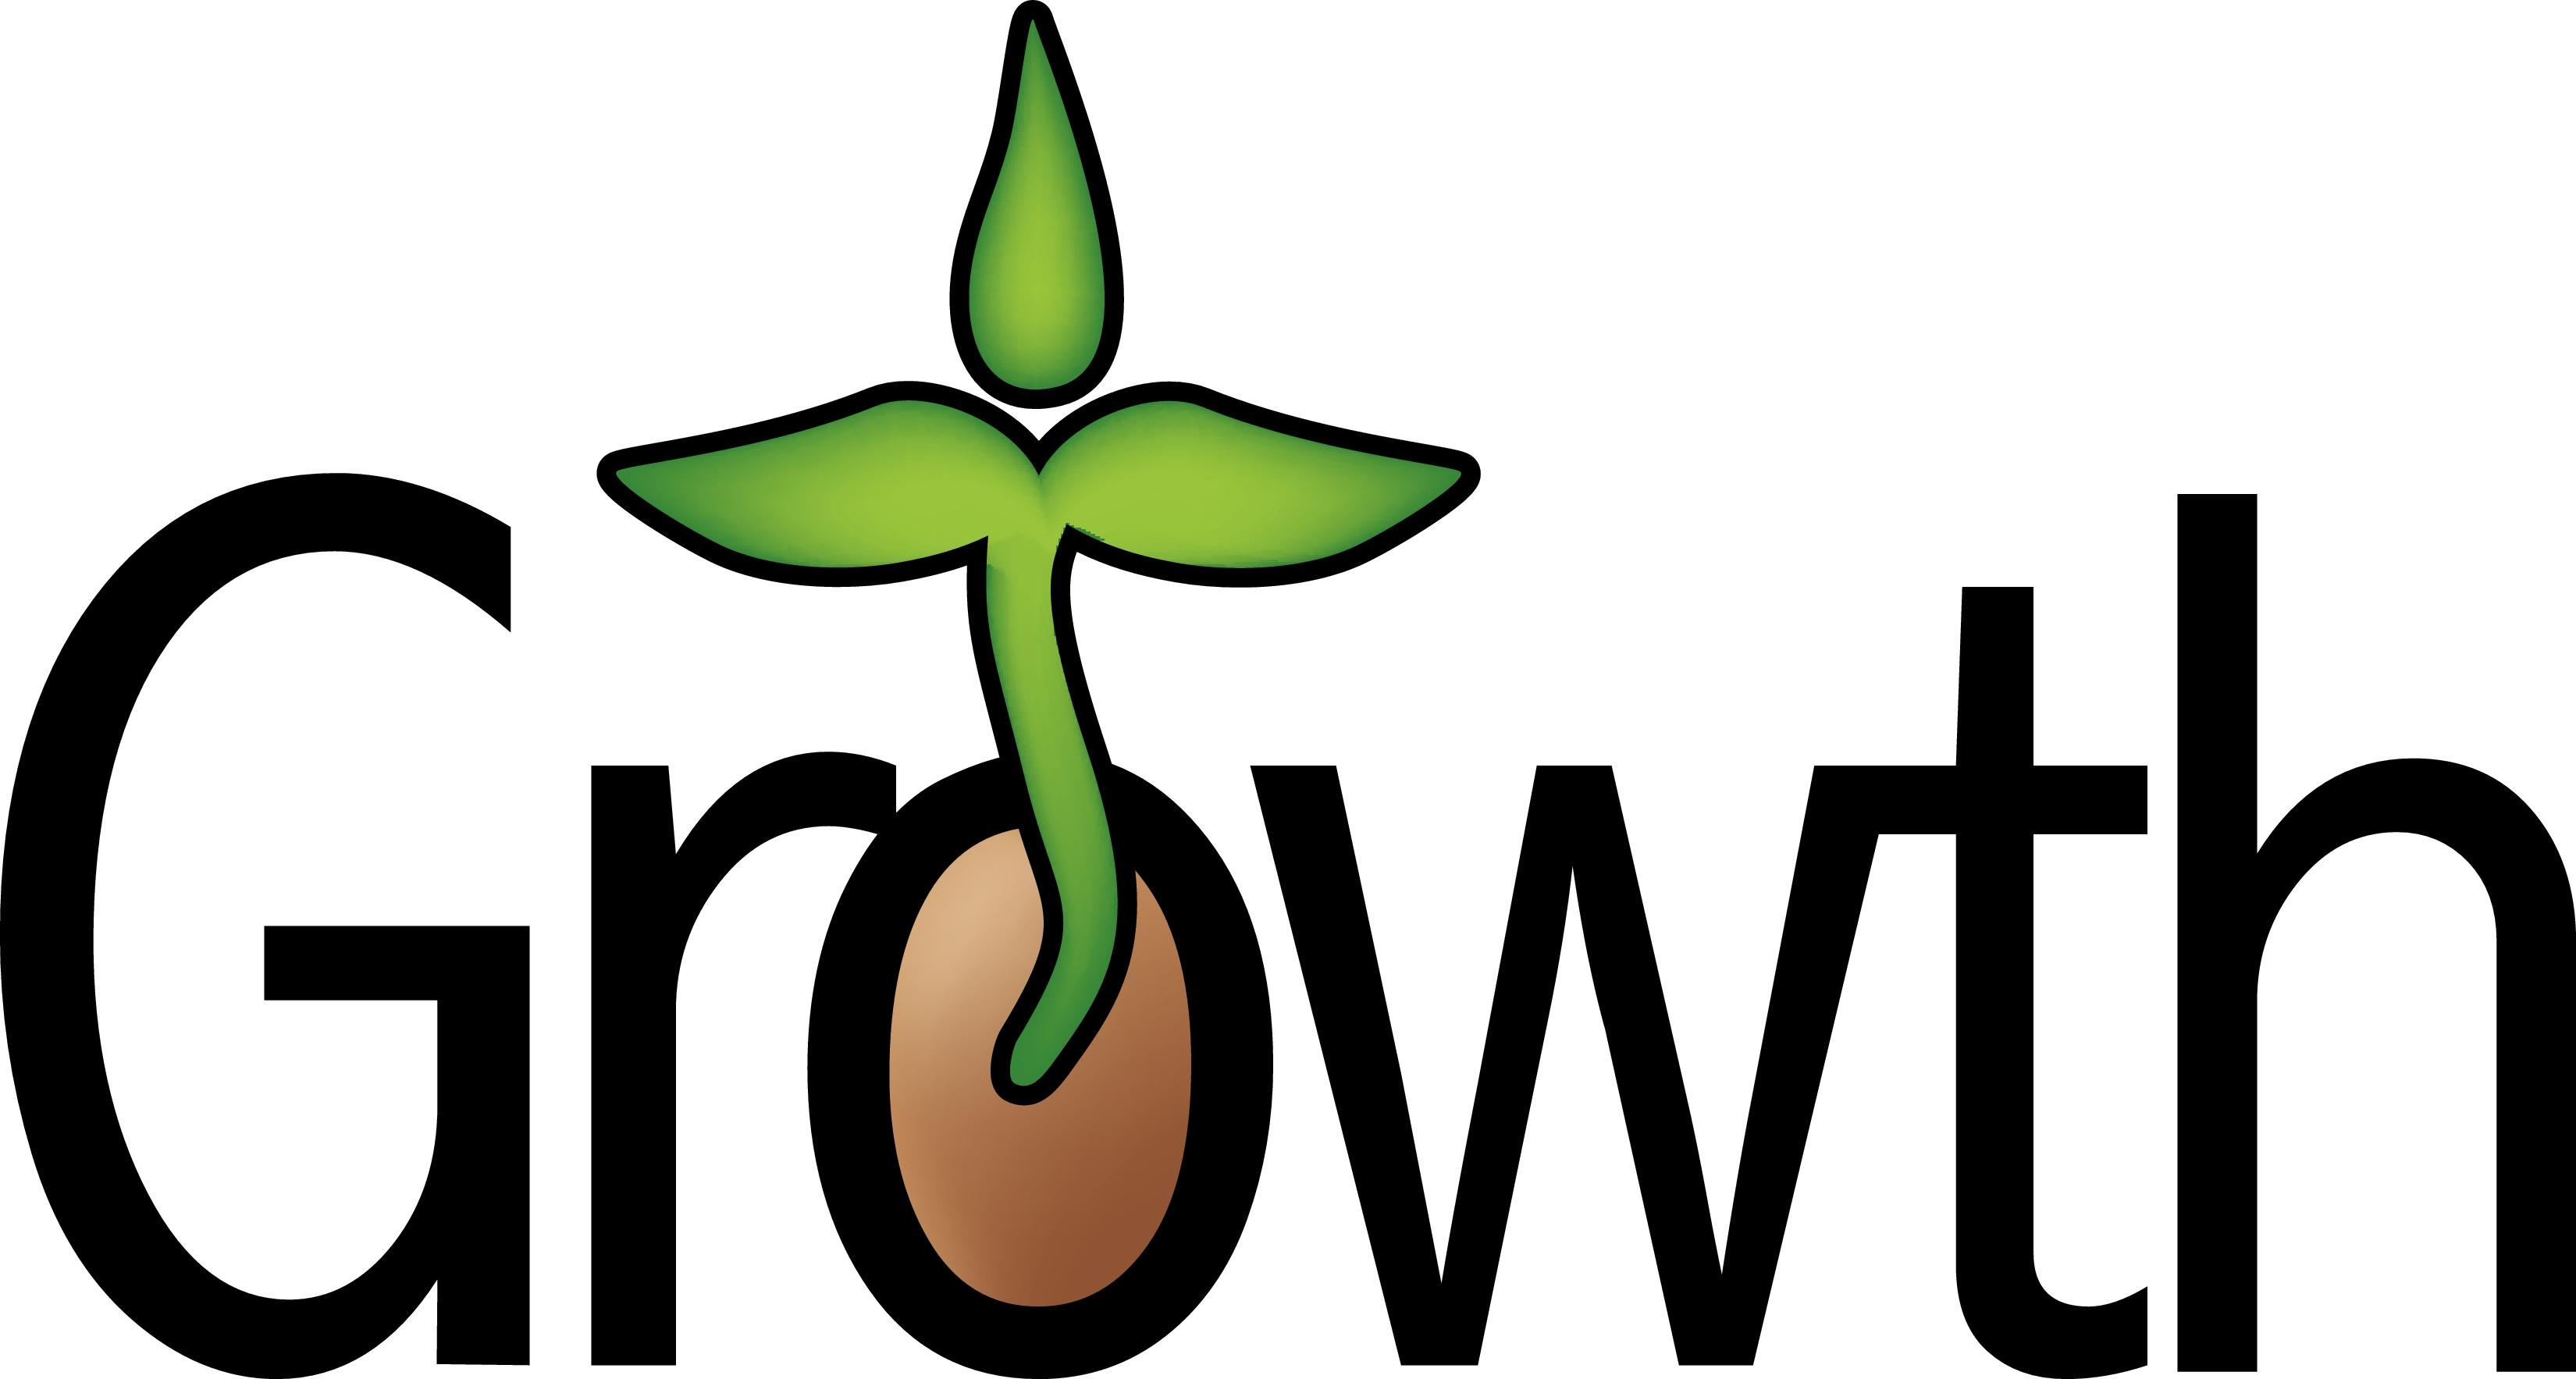 Faith clipart spiritual development, Faith spiritual development Transparent FREE for download on WebStockReview 2021